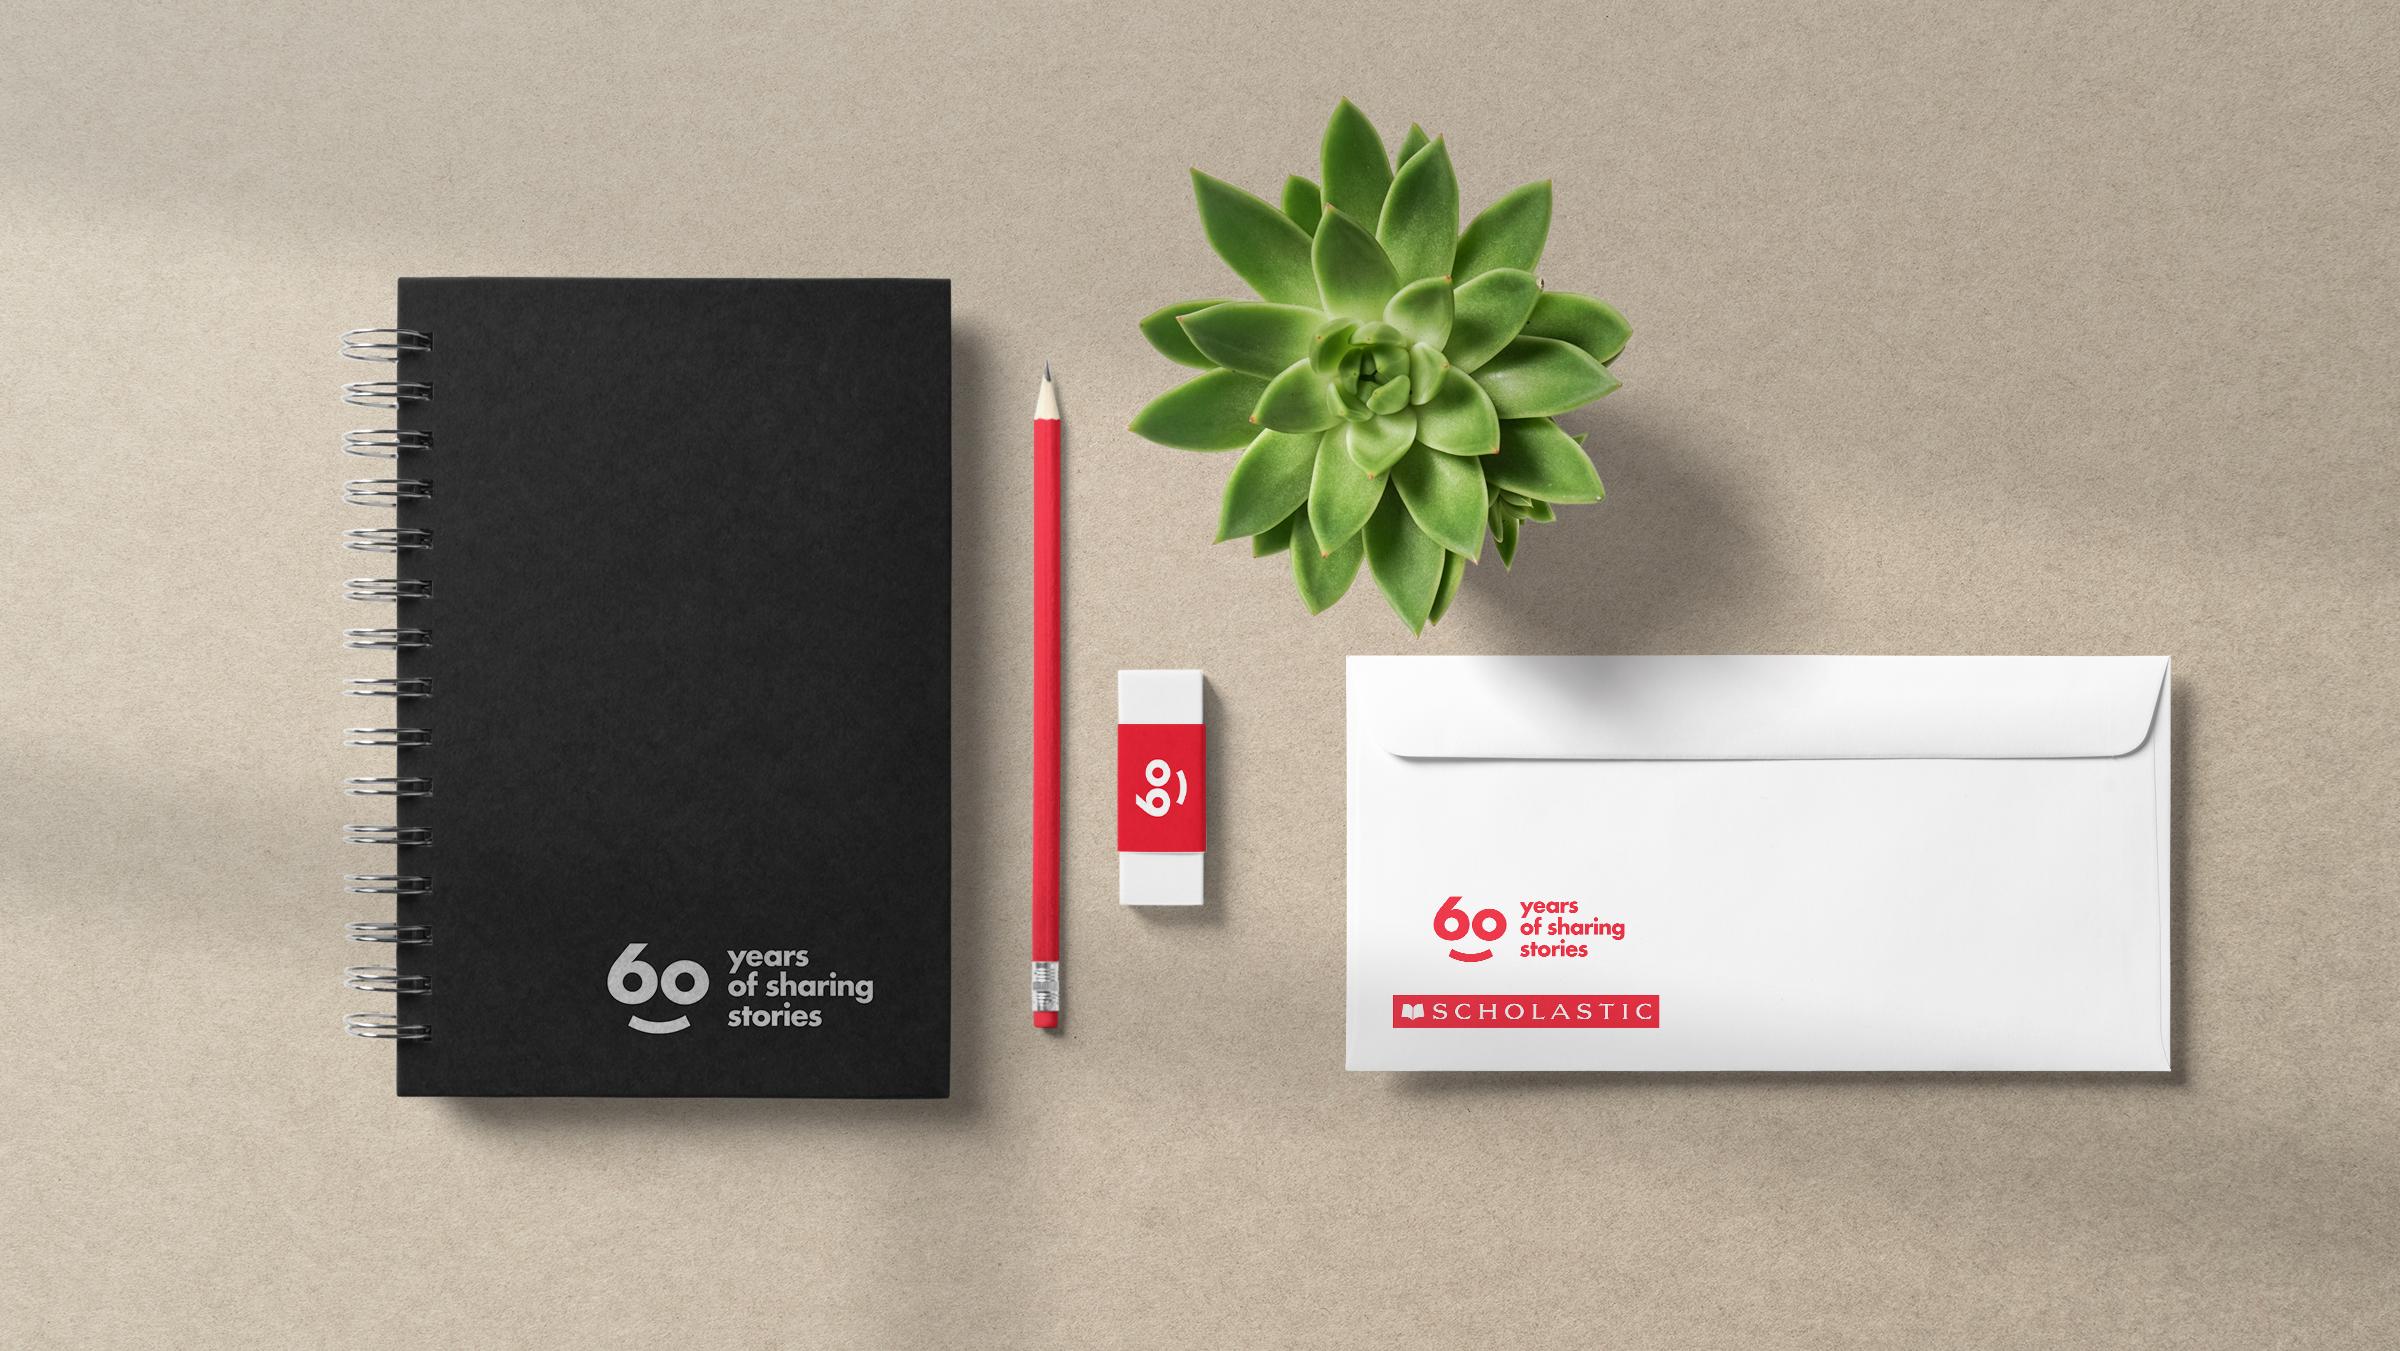 Scholastic 60 year anniversary brand stationery